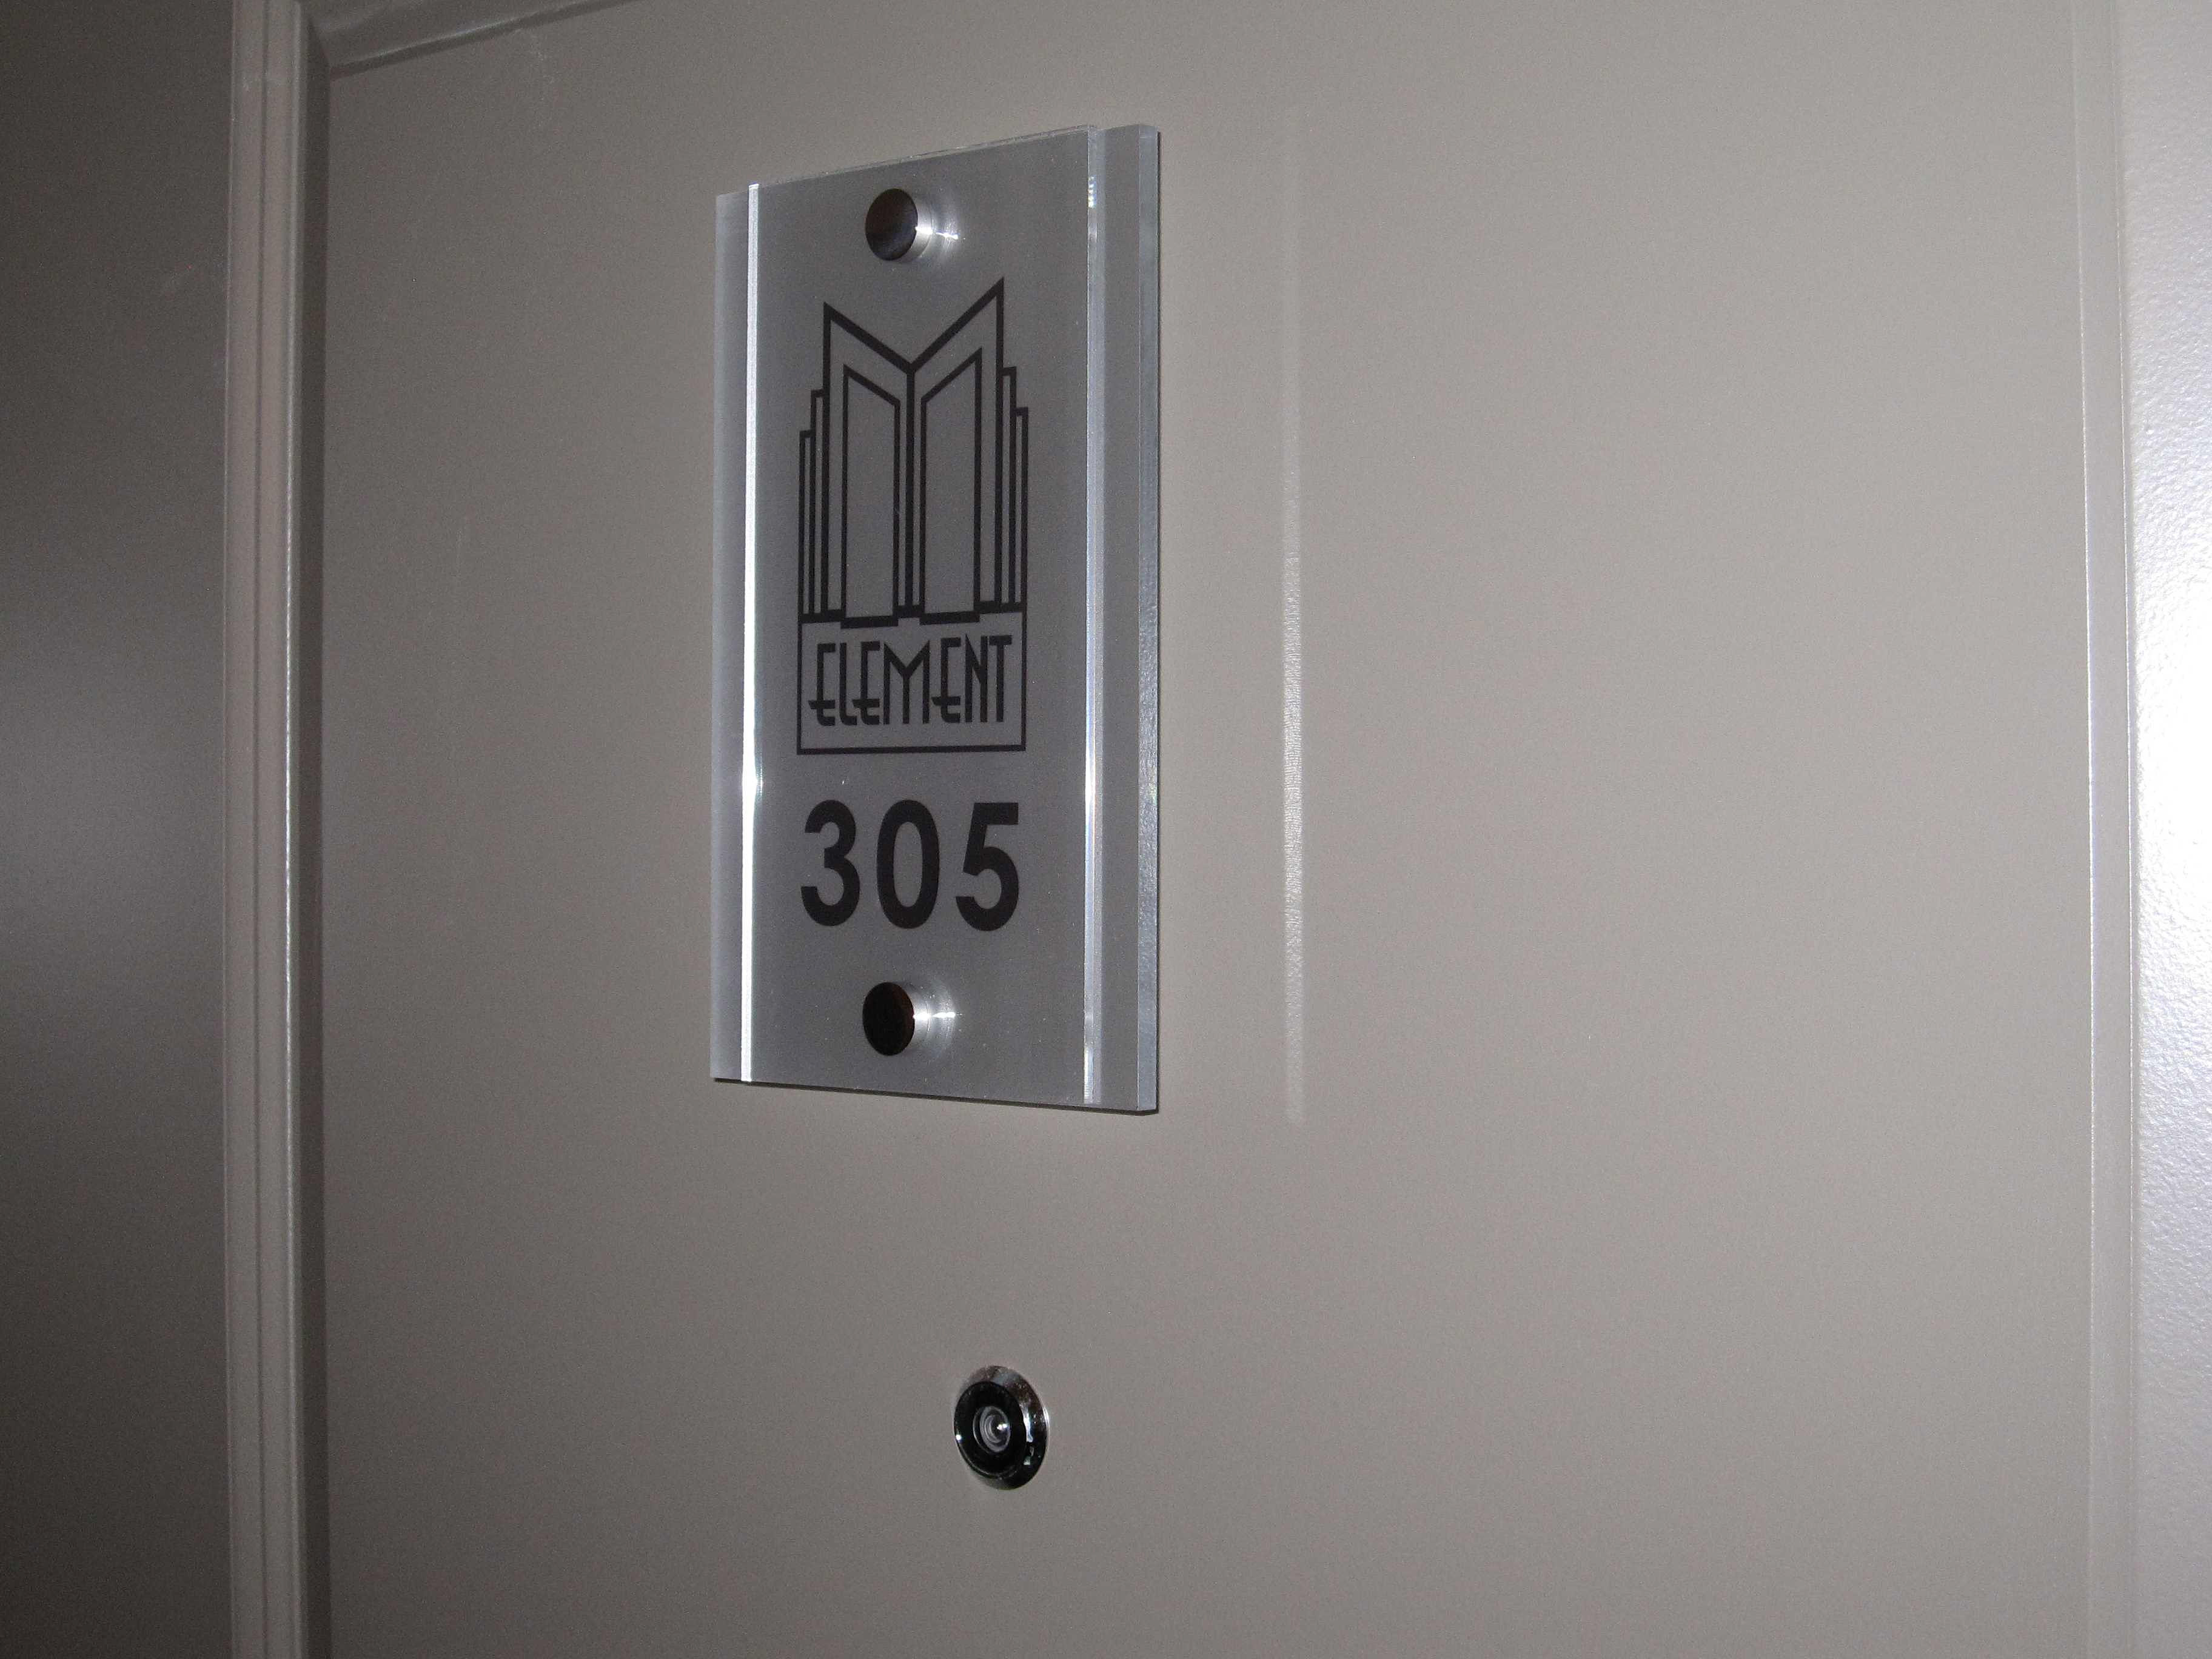 Select Graphix & Printing LTD. | Apartment Door Number Signs